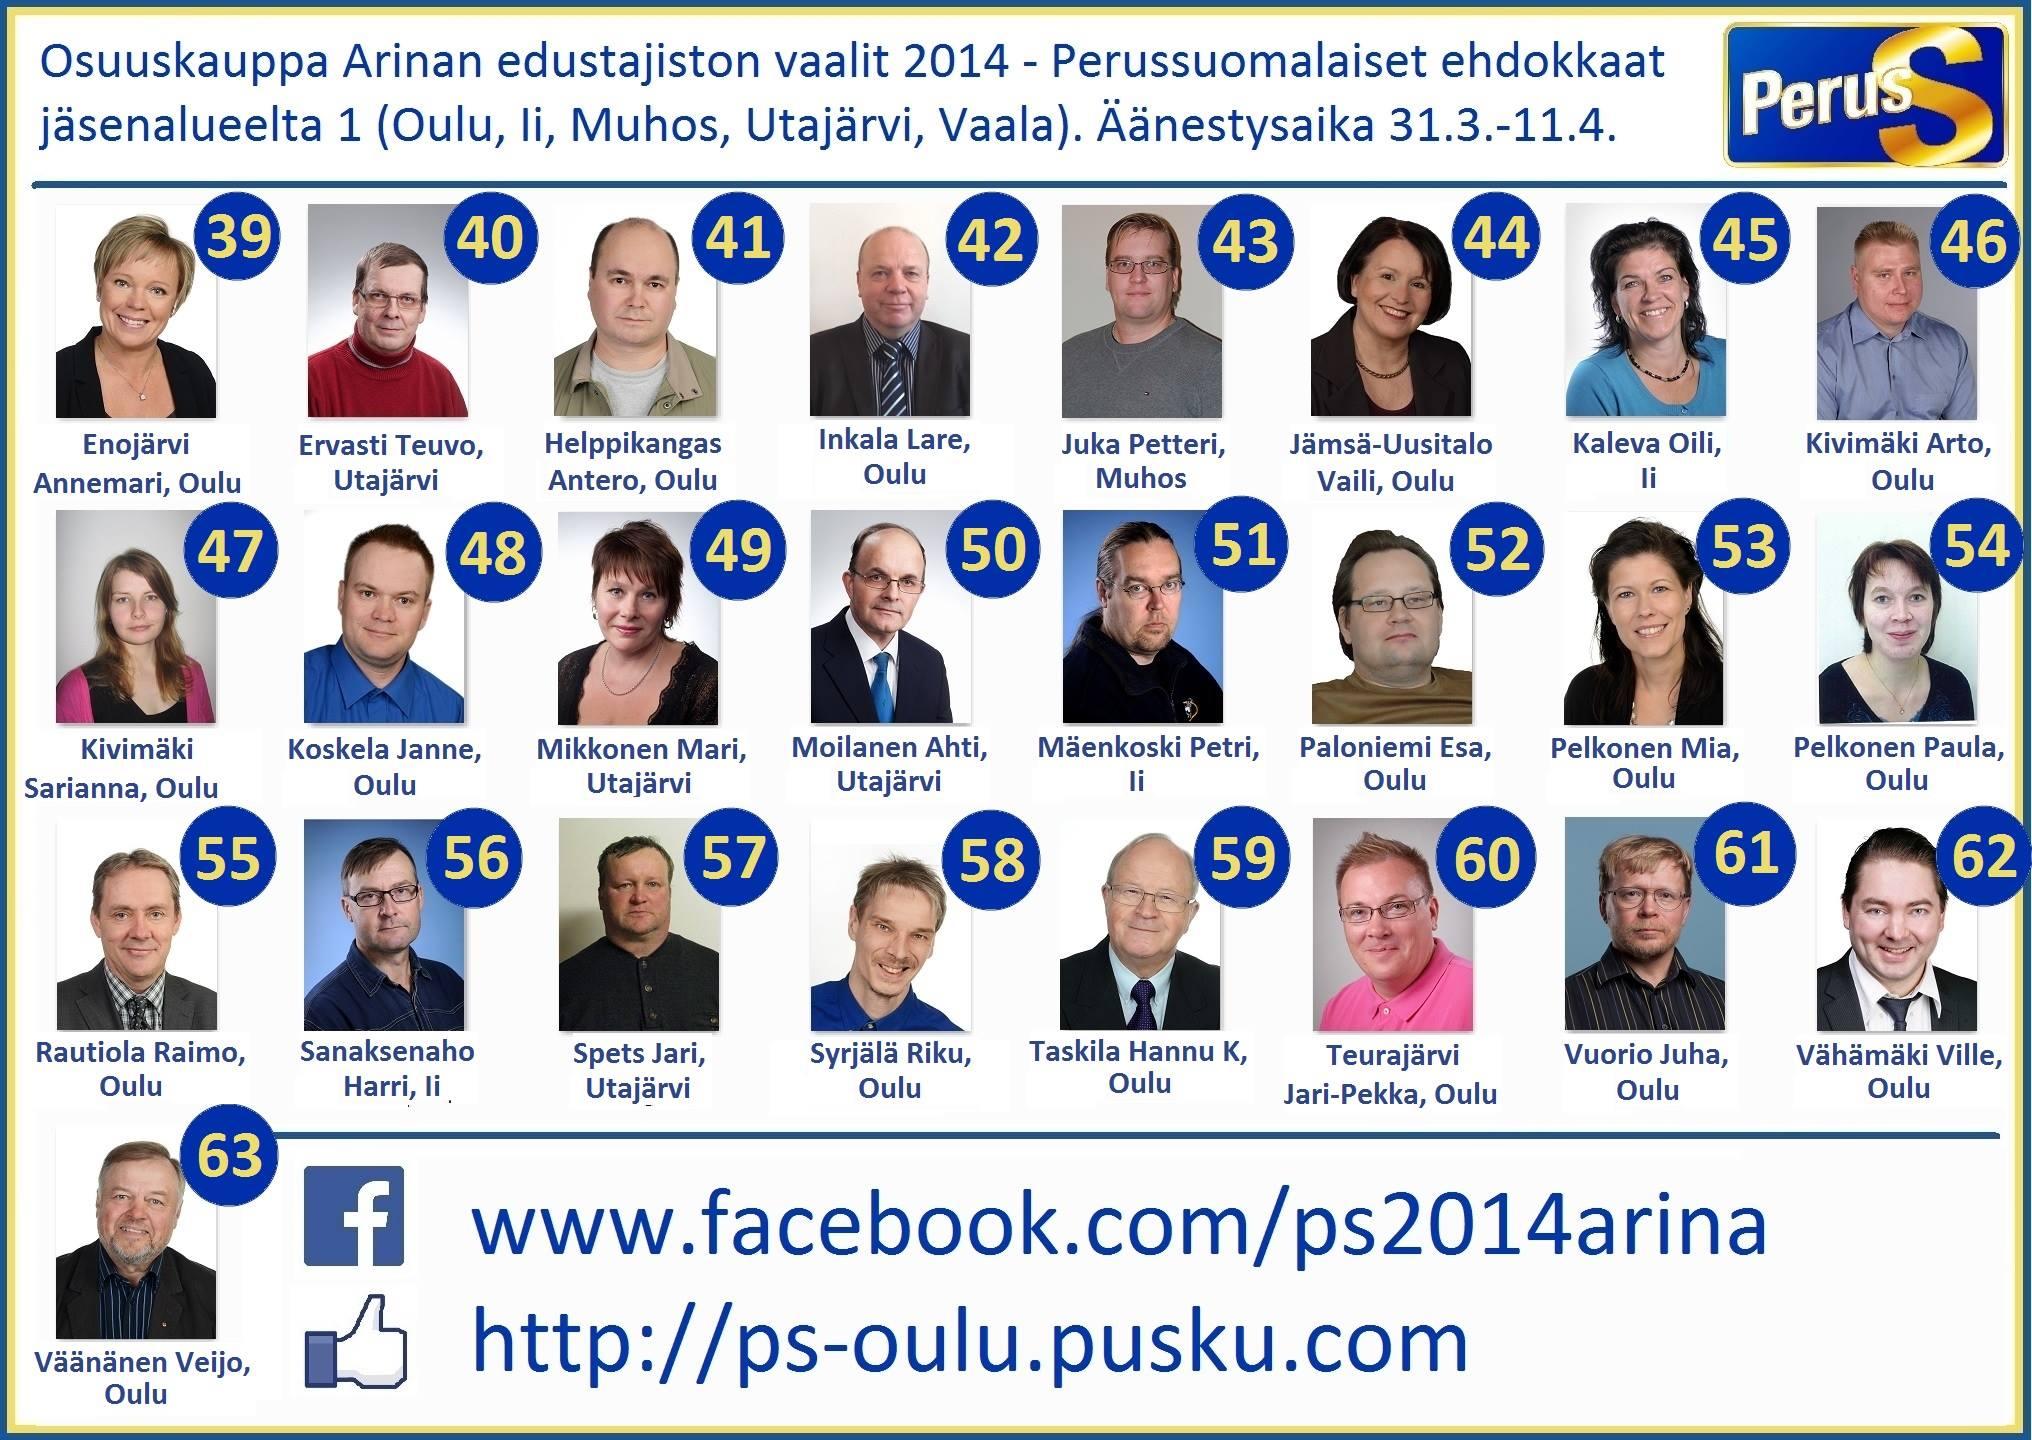 Perussuomalaiset Oulu